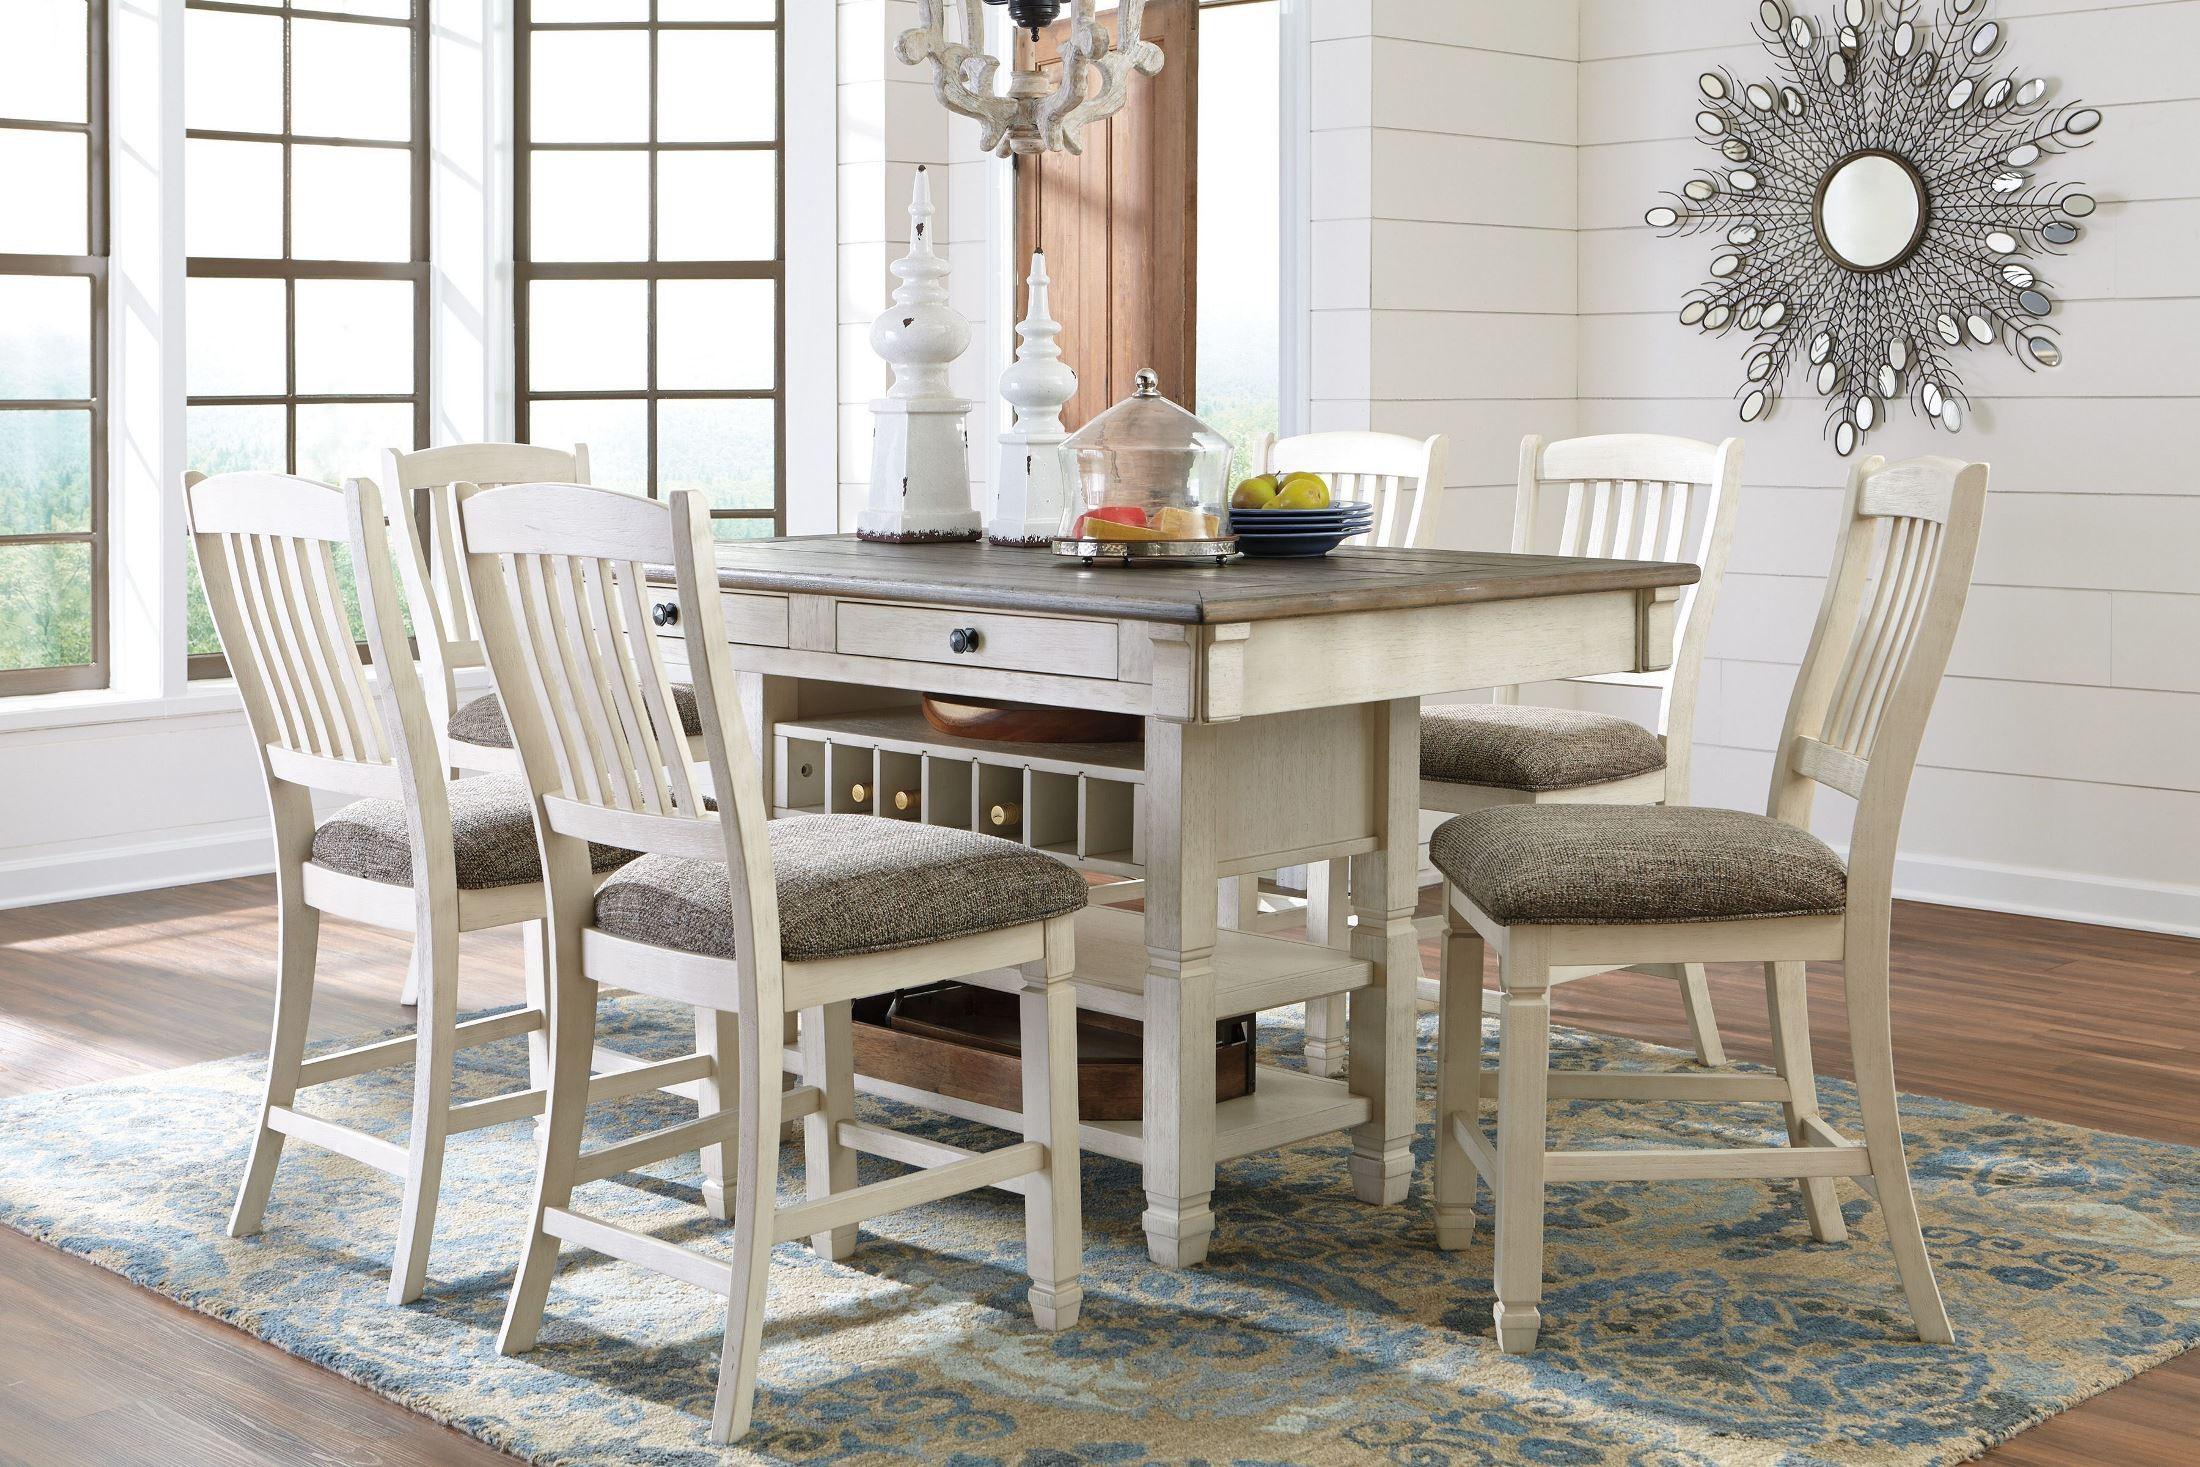 Bolanburg White And Gray Rectangular Counter Height Dining